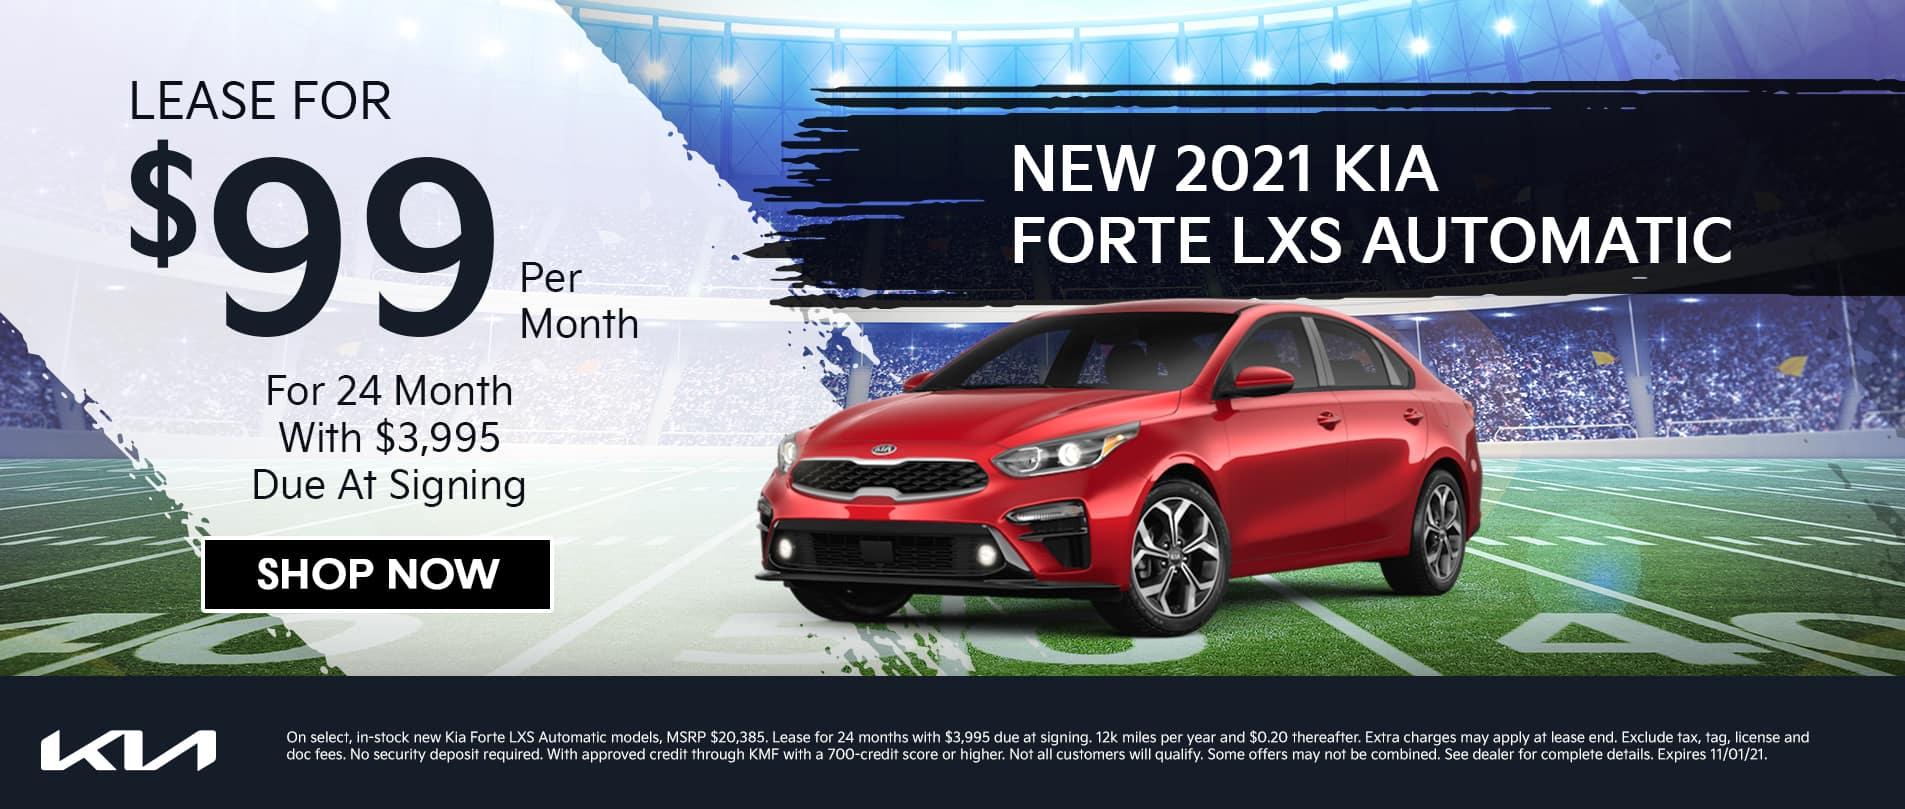 180-1021-SKW1553-SL-Forte